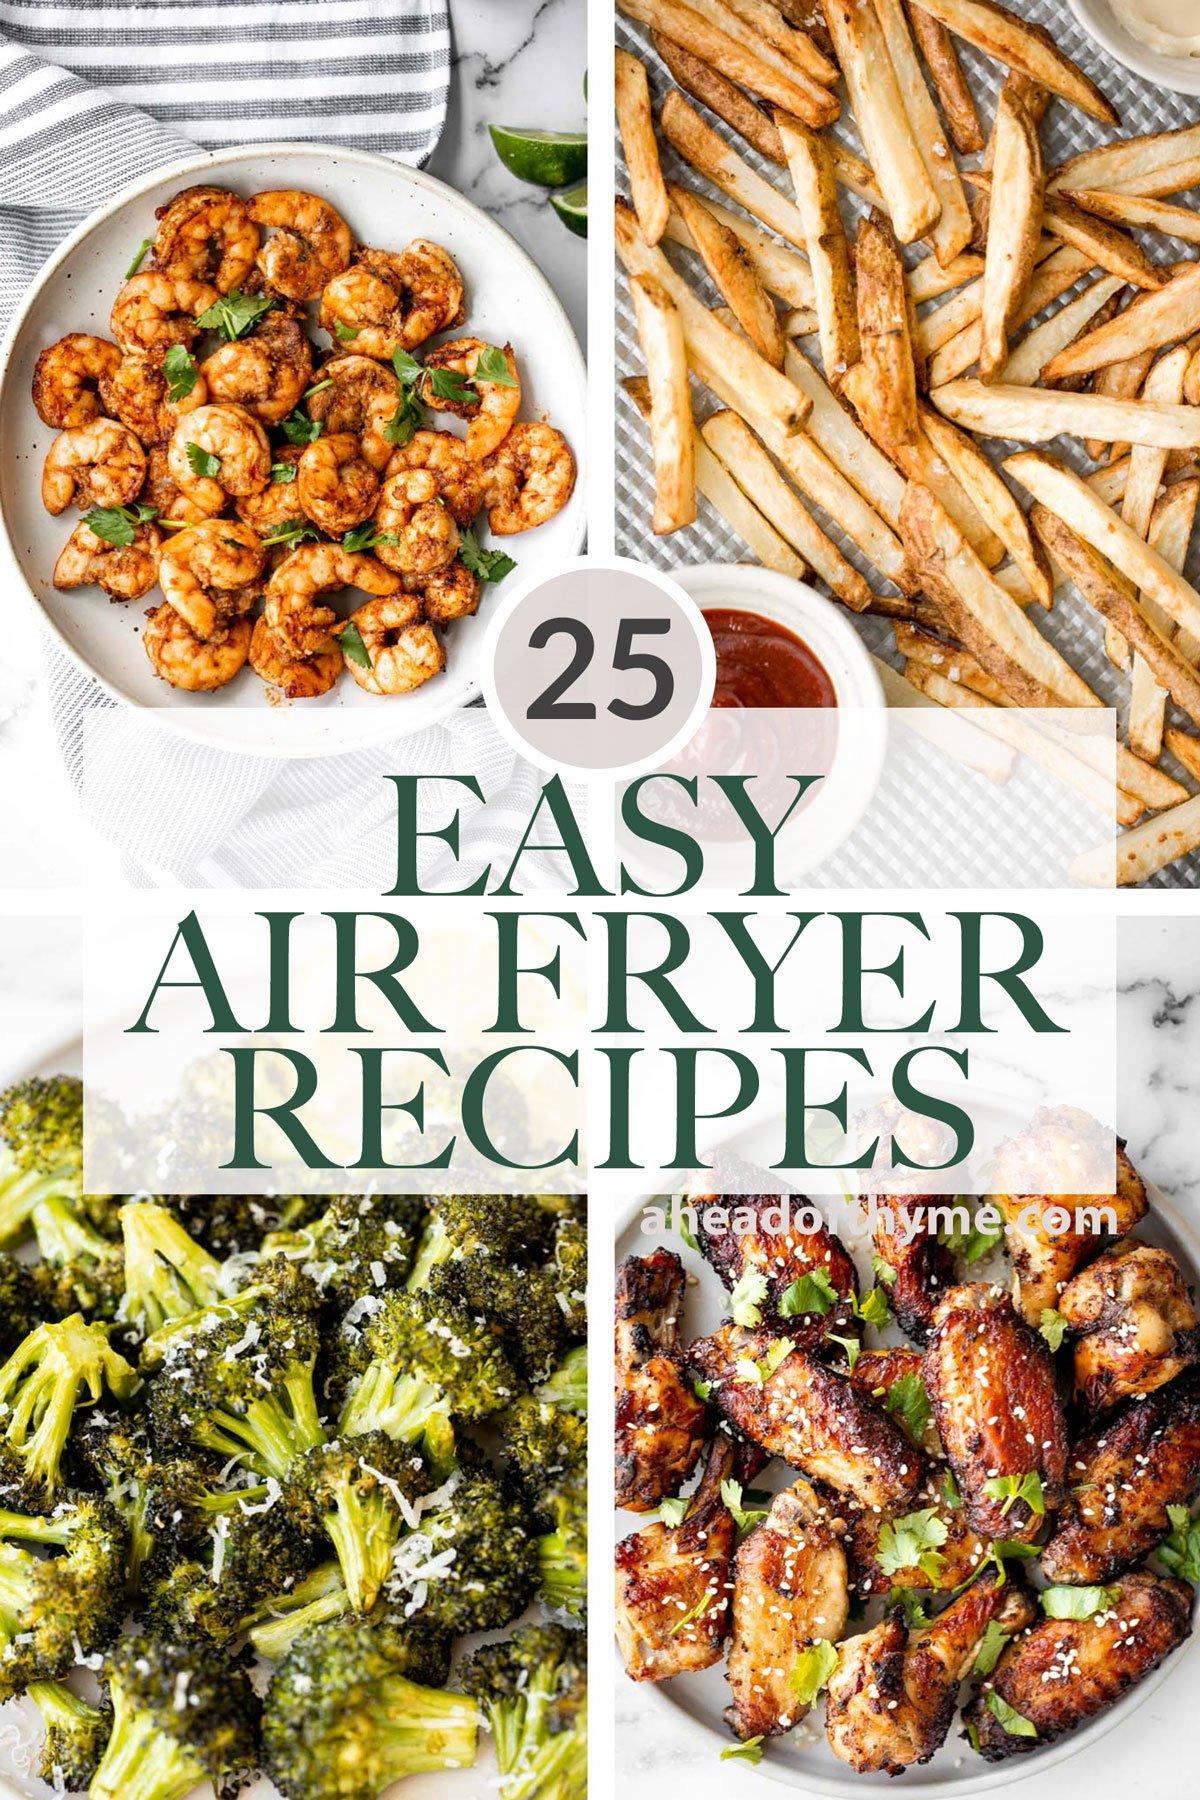 25 Easy Air Fryer Recipes